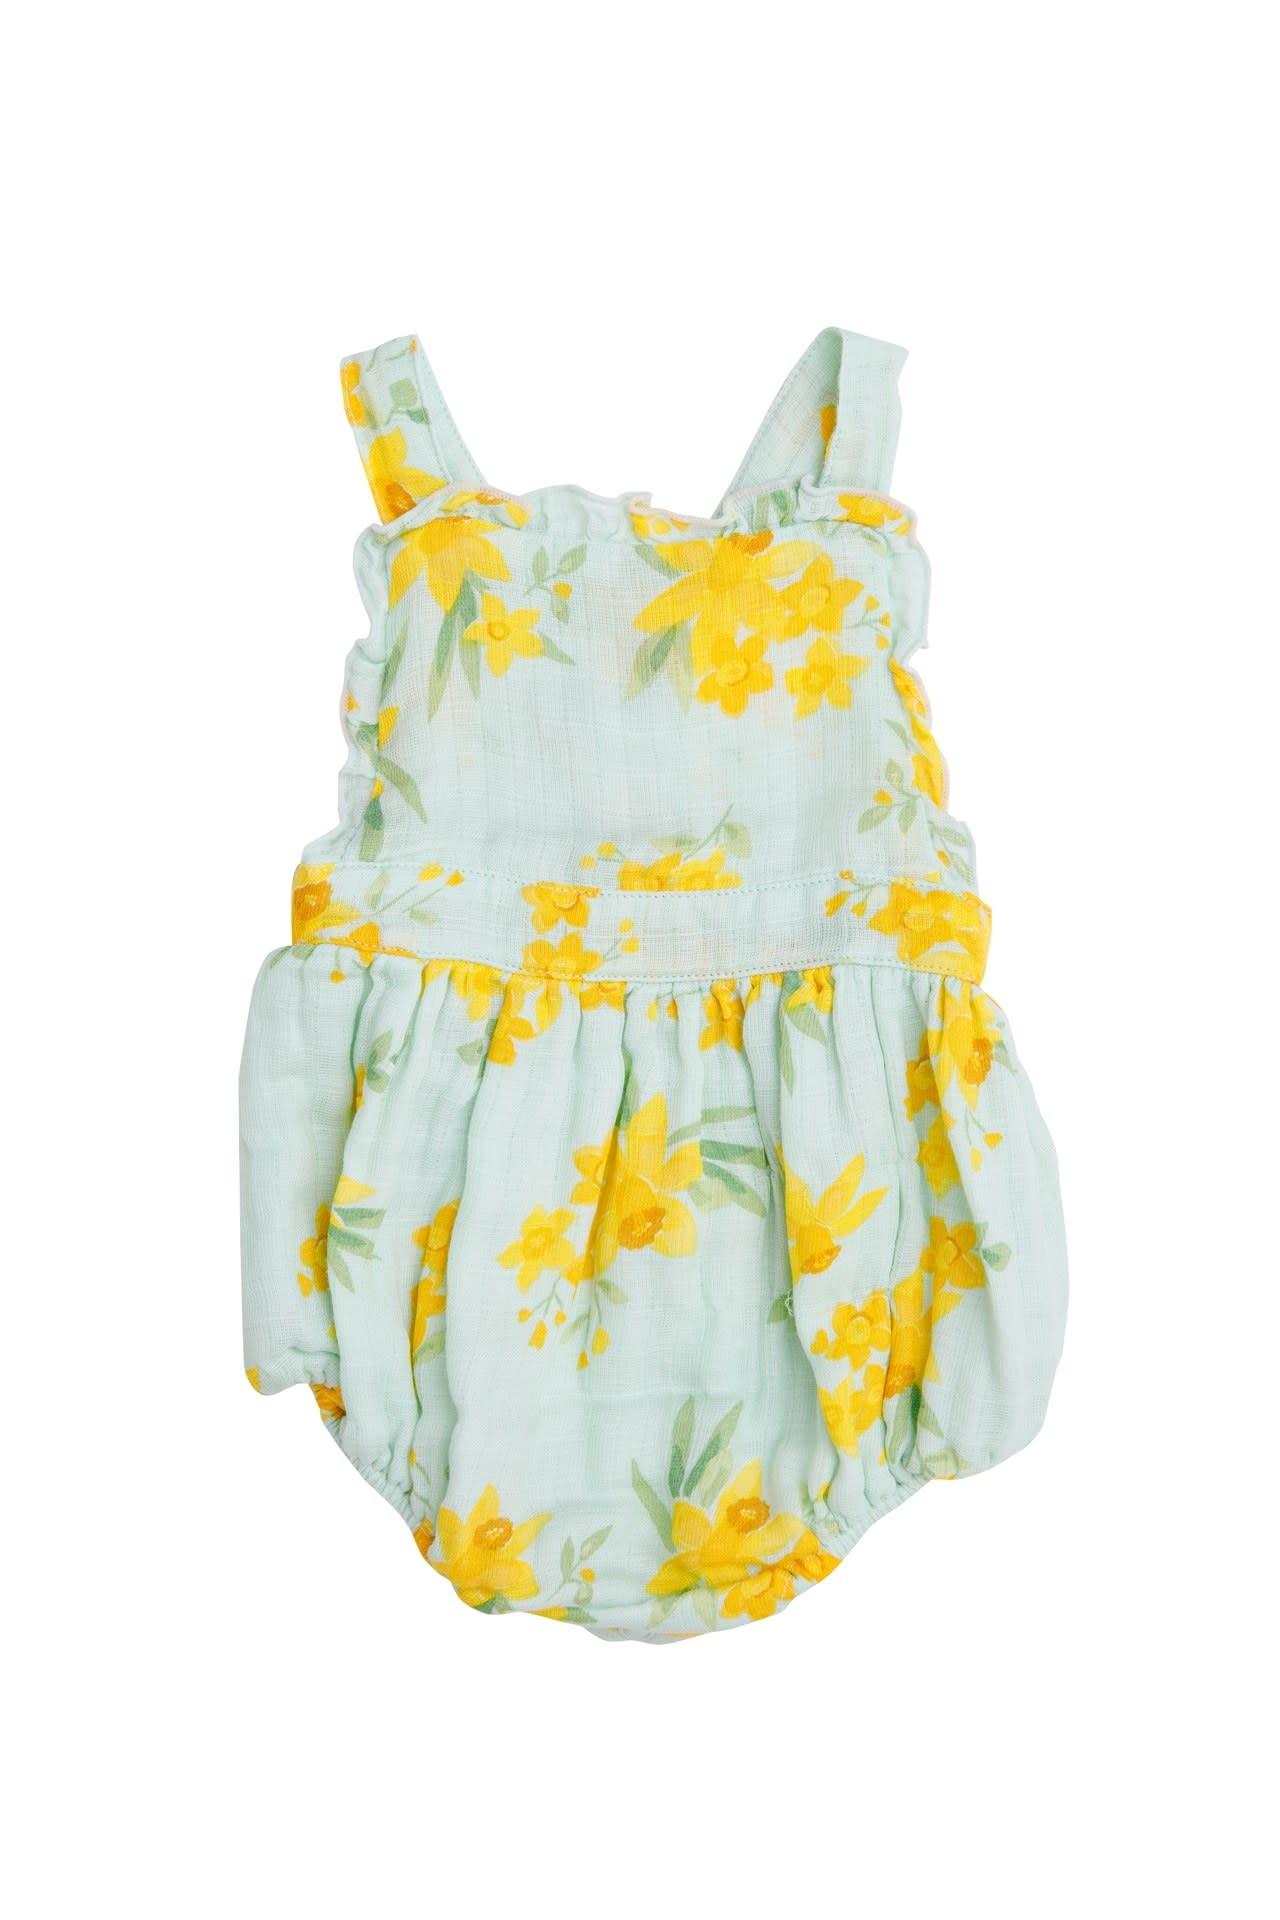 Angel Dear Daffodils Ruffle Bib Bubble Mint